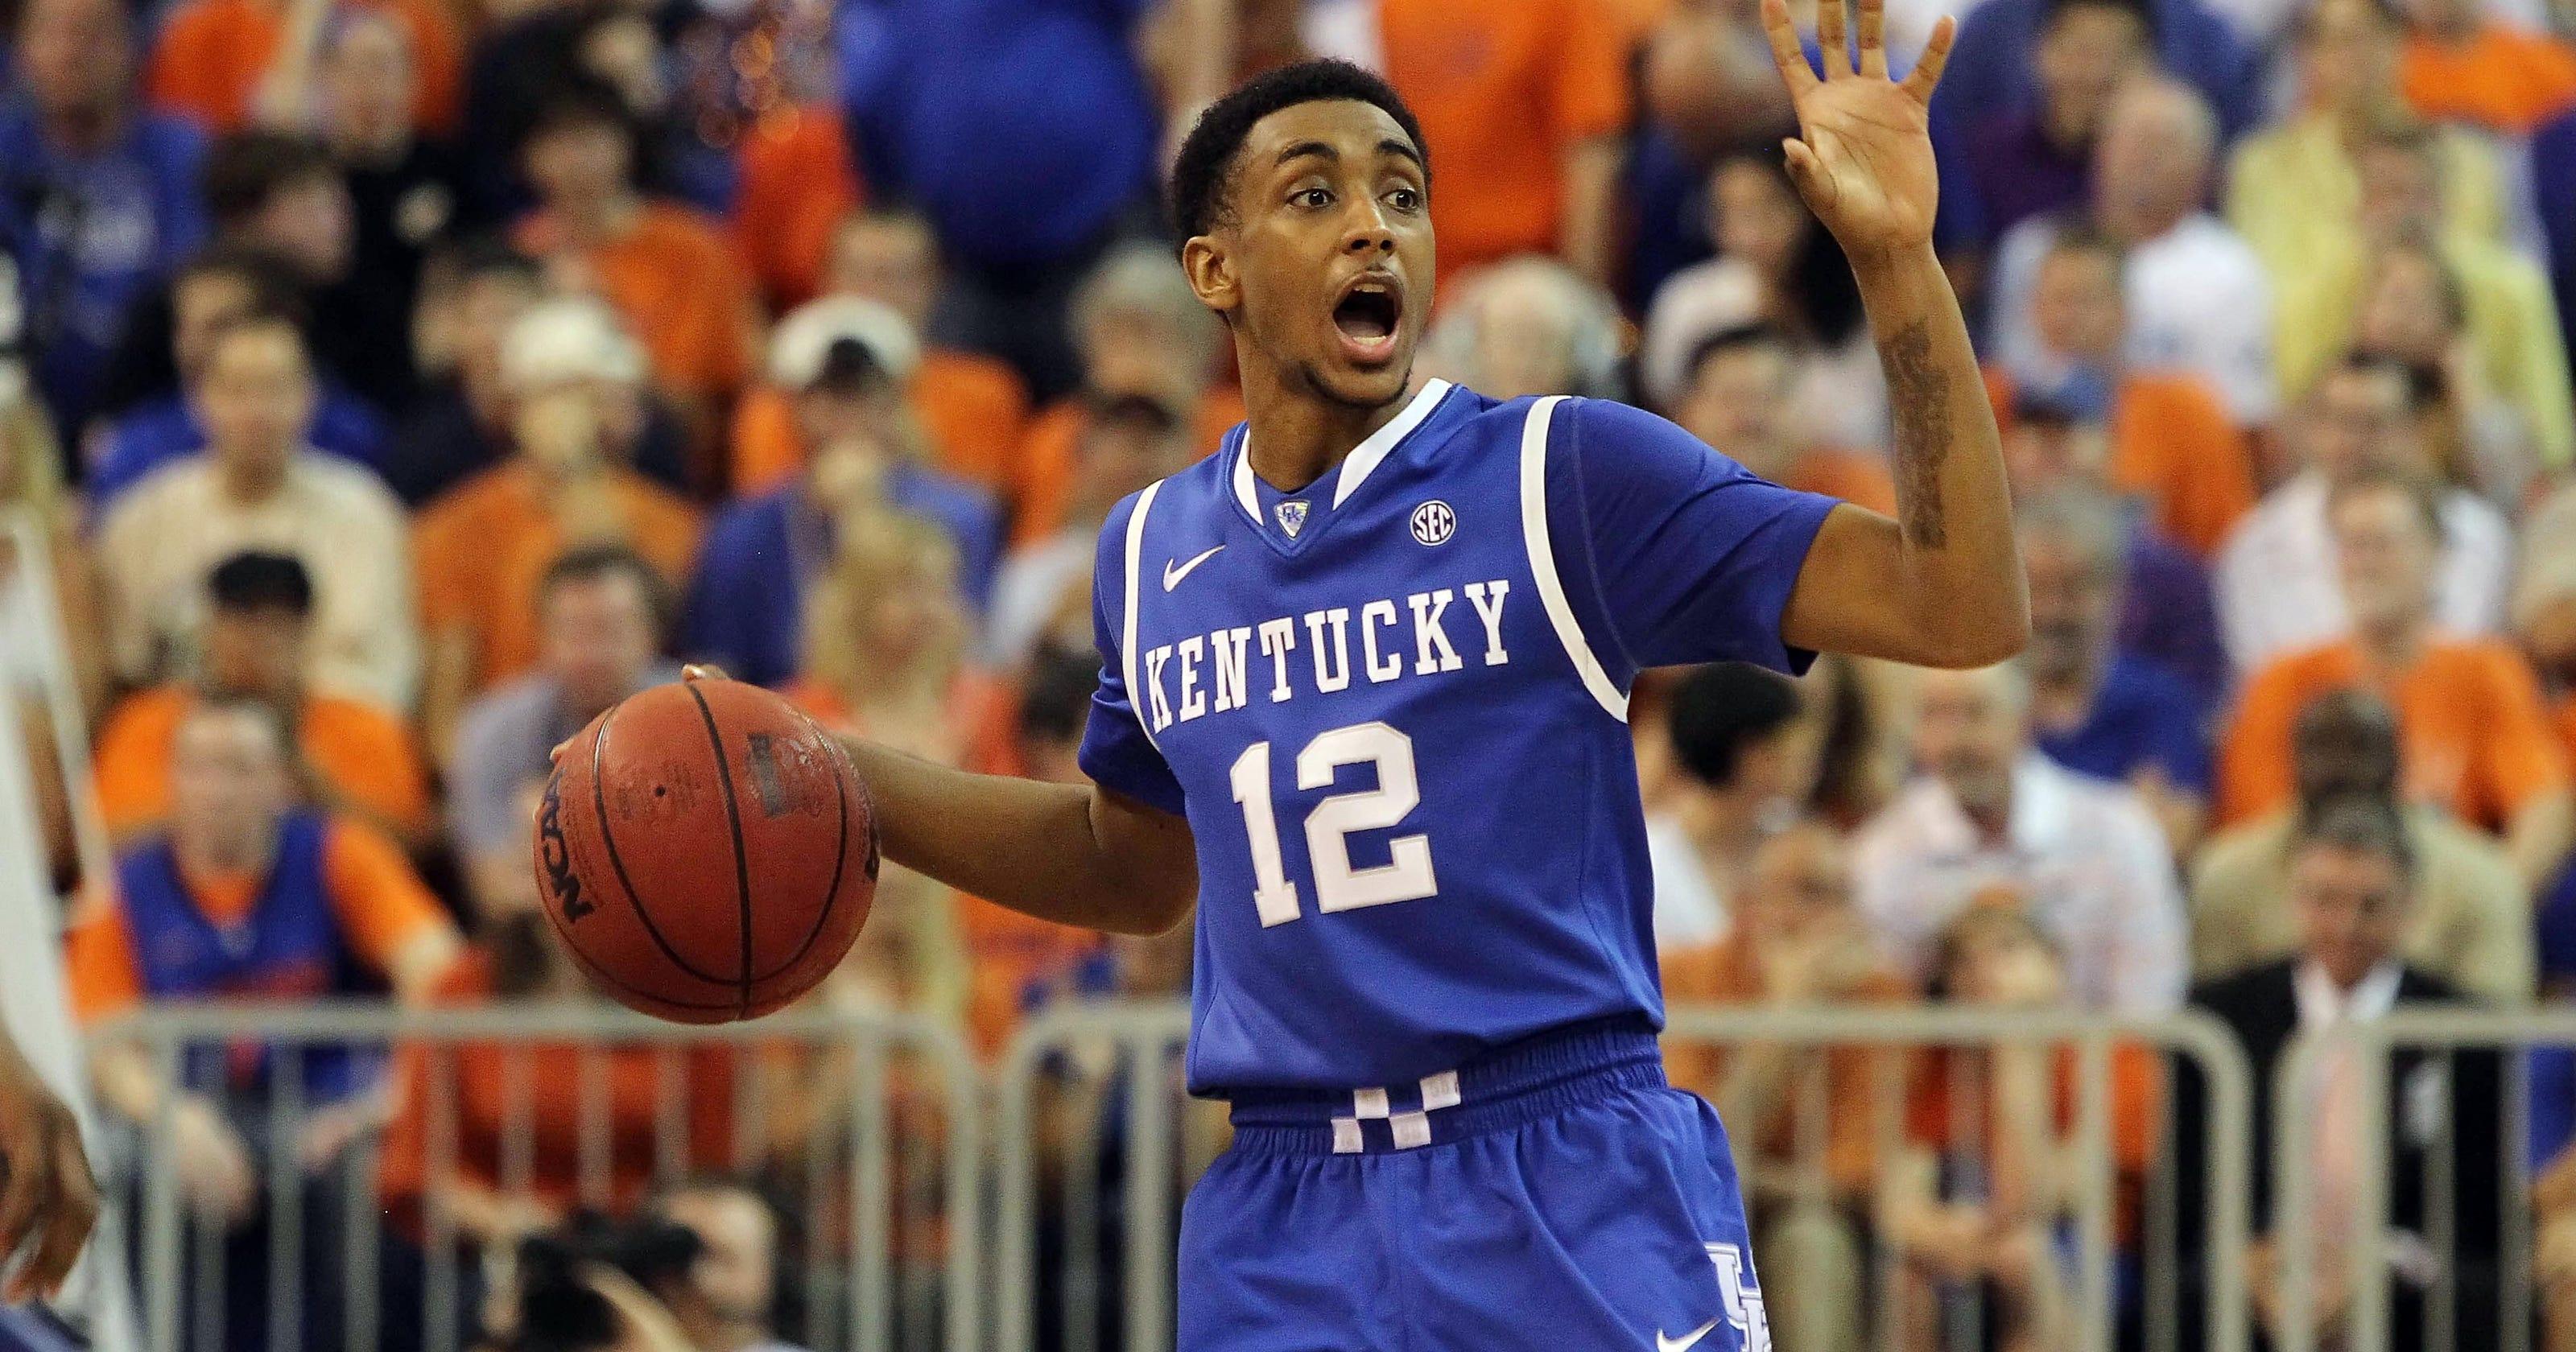 Kentucky Basketball Wildcats Have Two Usa Today: Kentucky's Ryan Harrow Plans Transfer To Georgia State